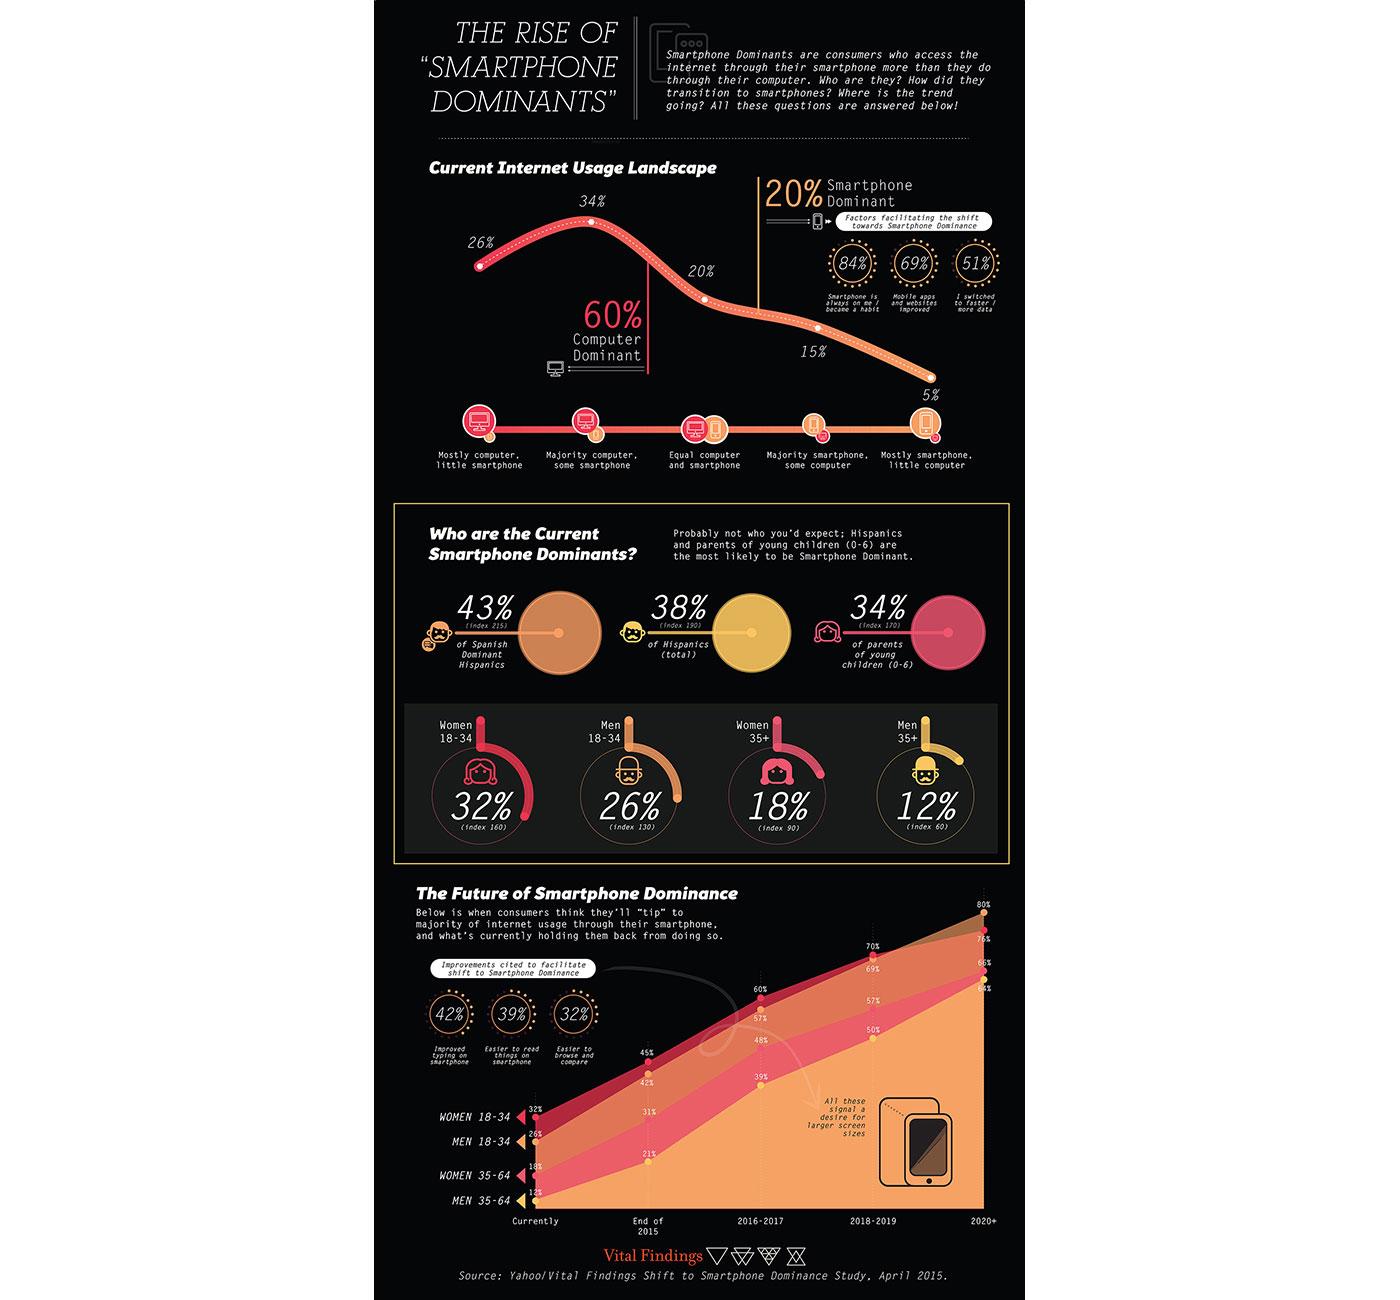 Market Research Infographic - Smartphones